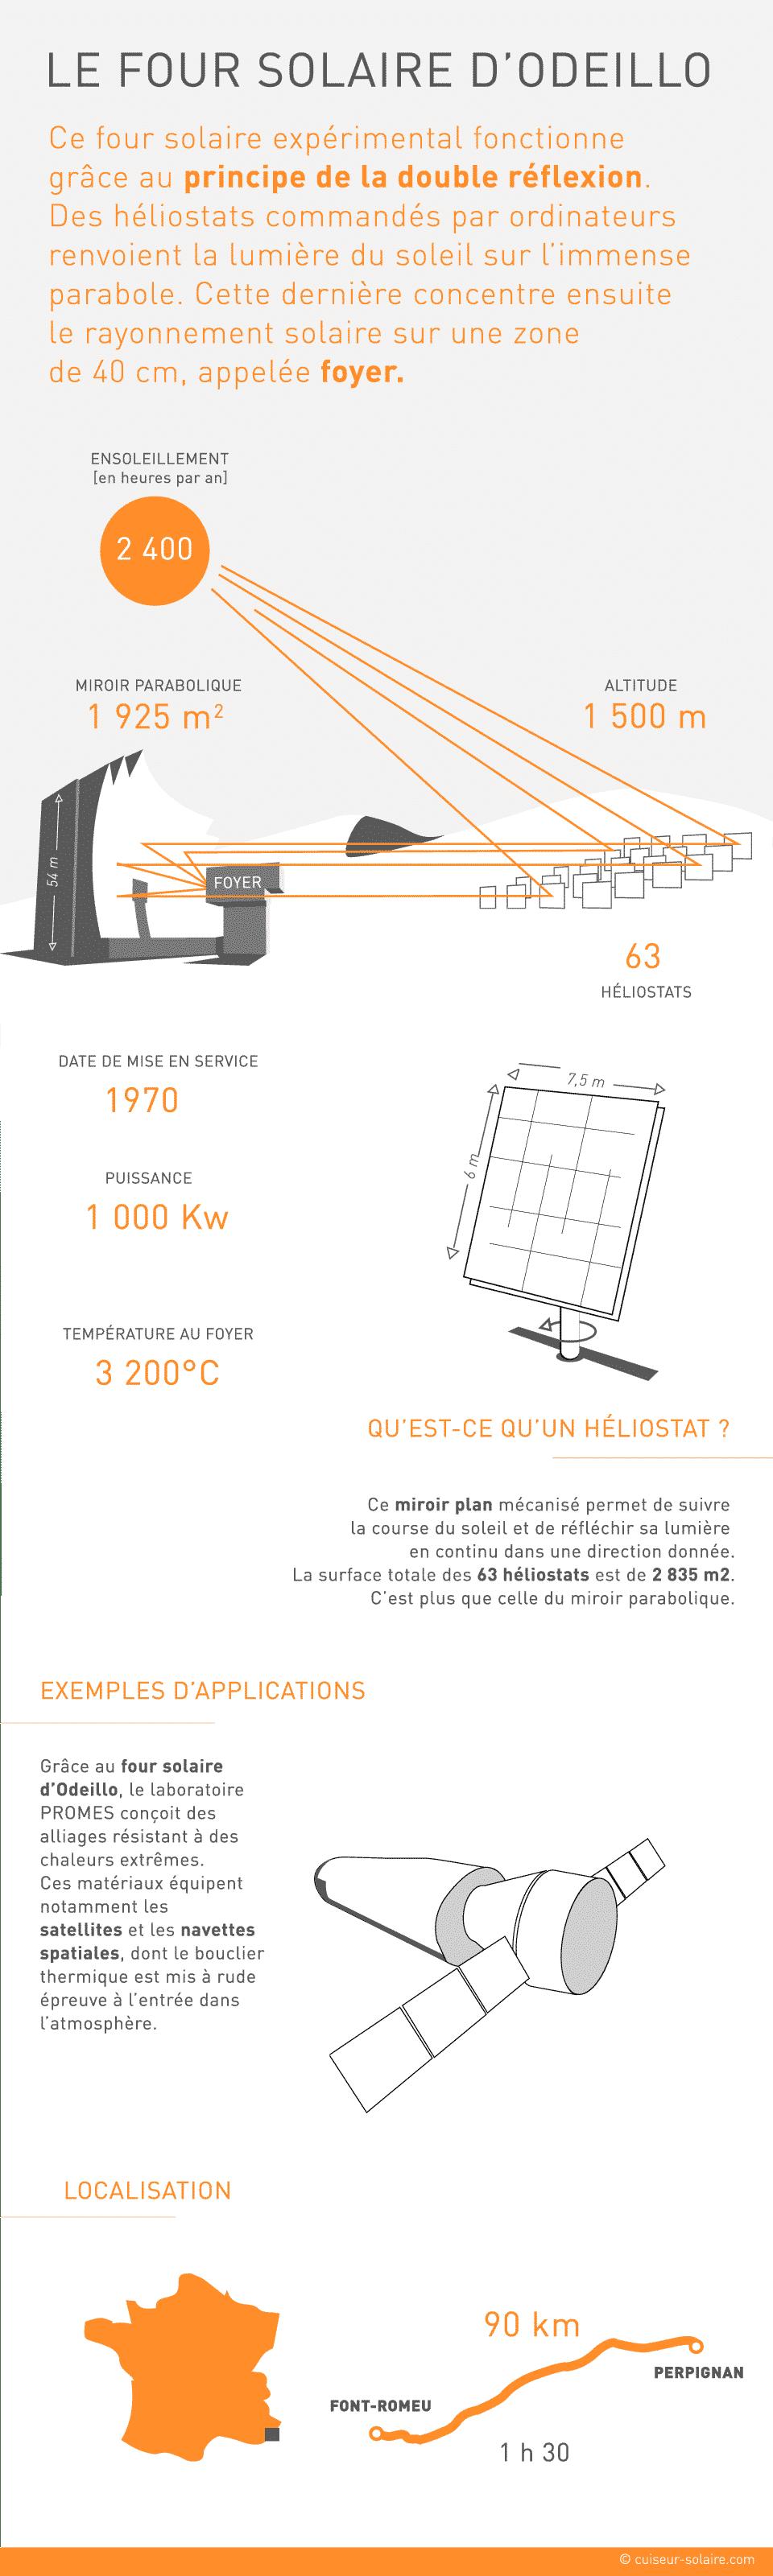 infographie four solaire odeillo